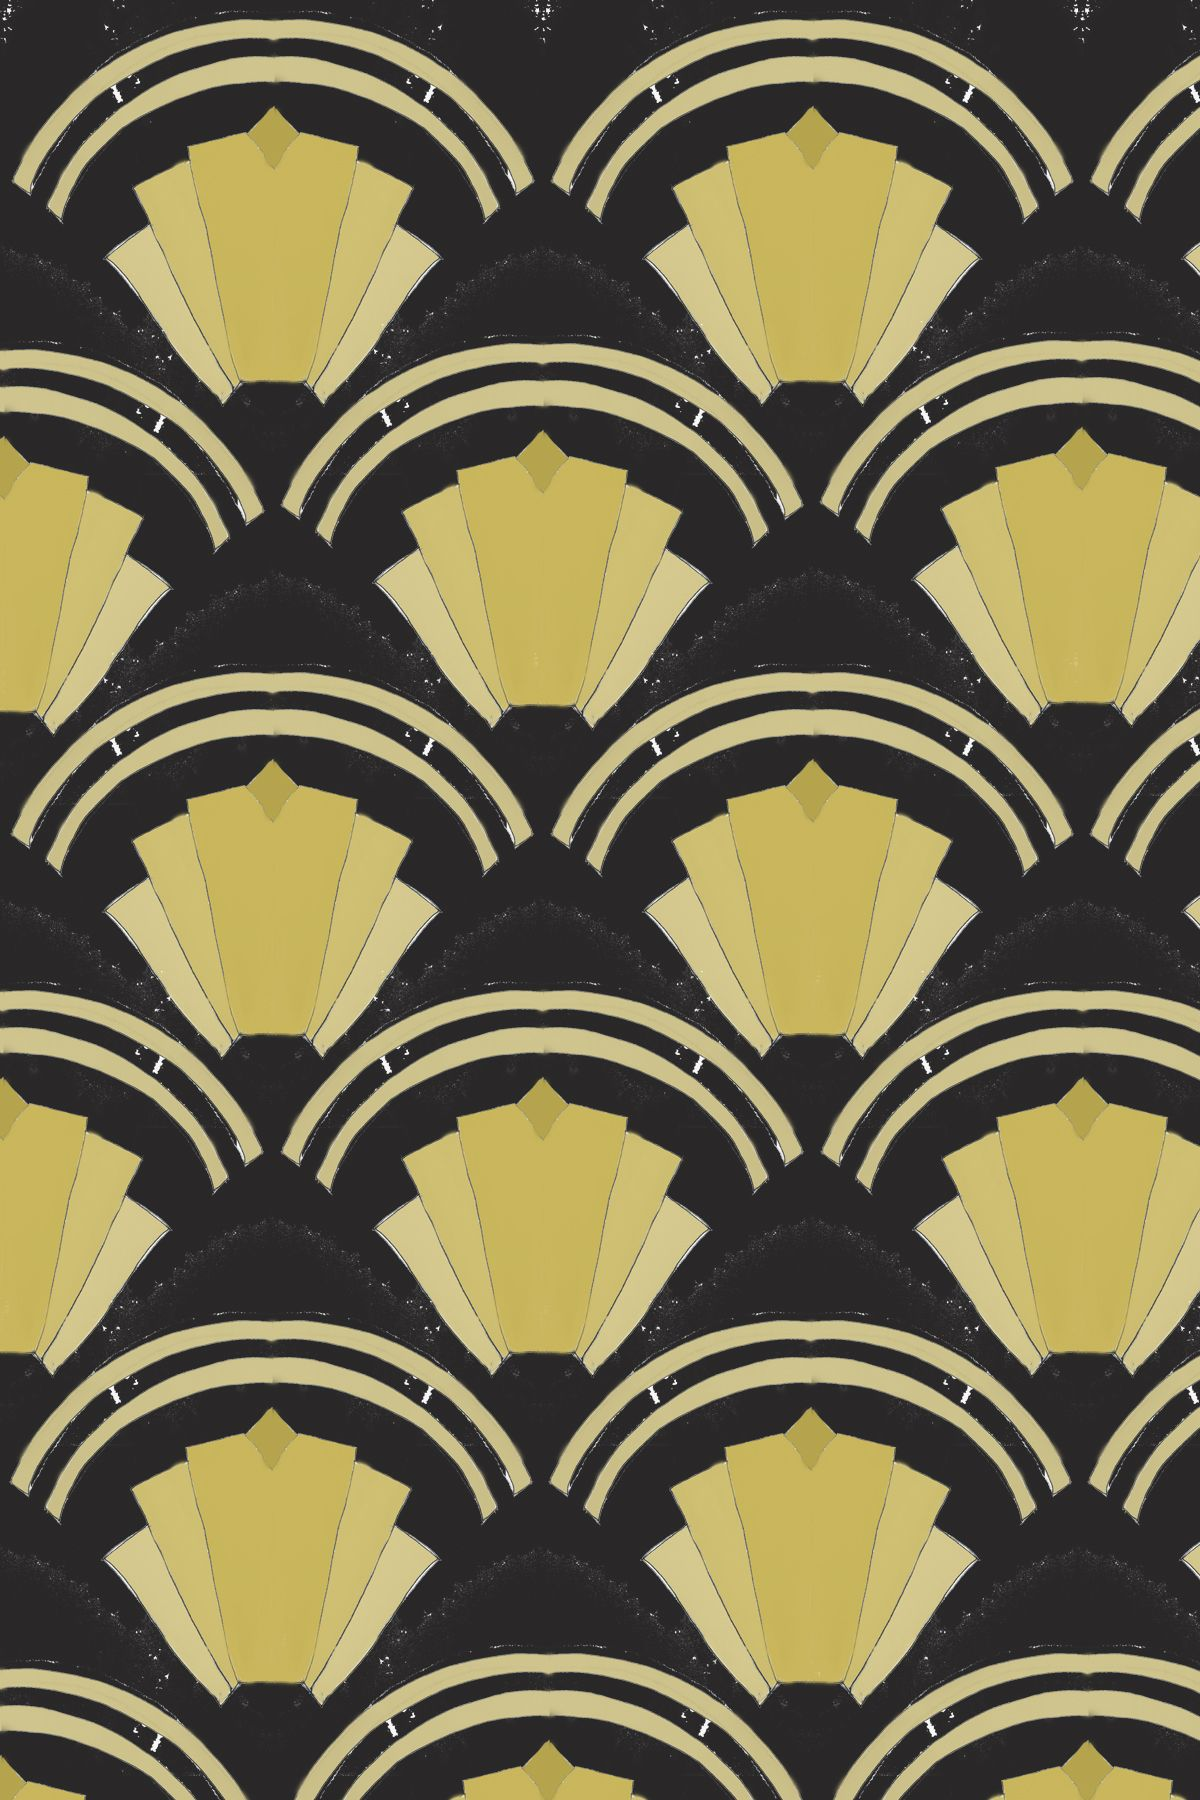 Art Deco style wallpaper harrawaydesign Gold and black represent